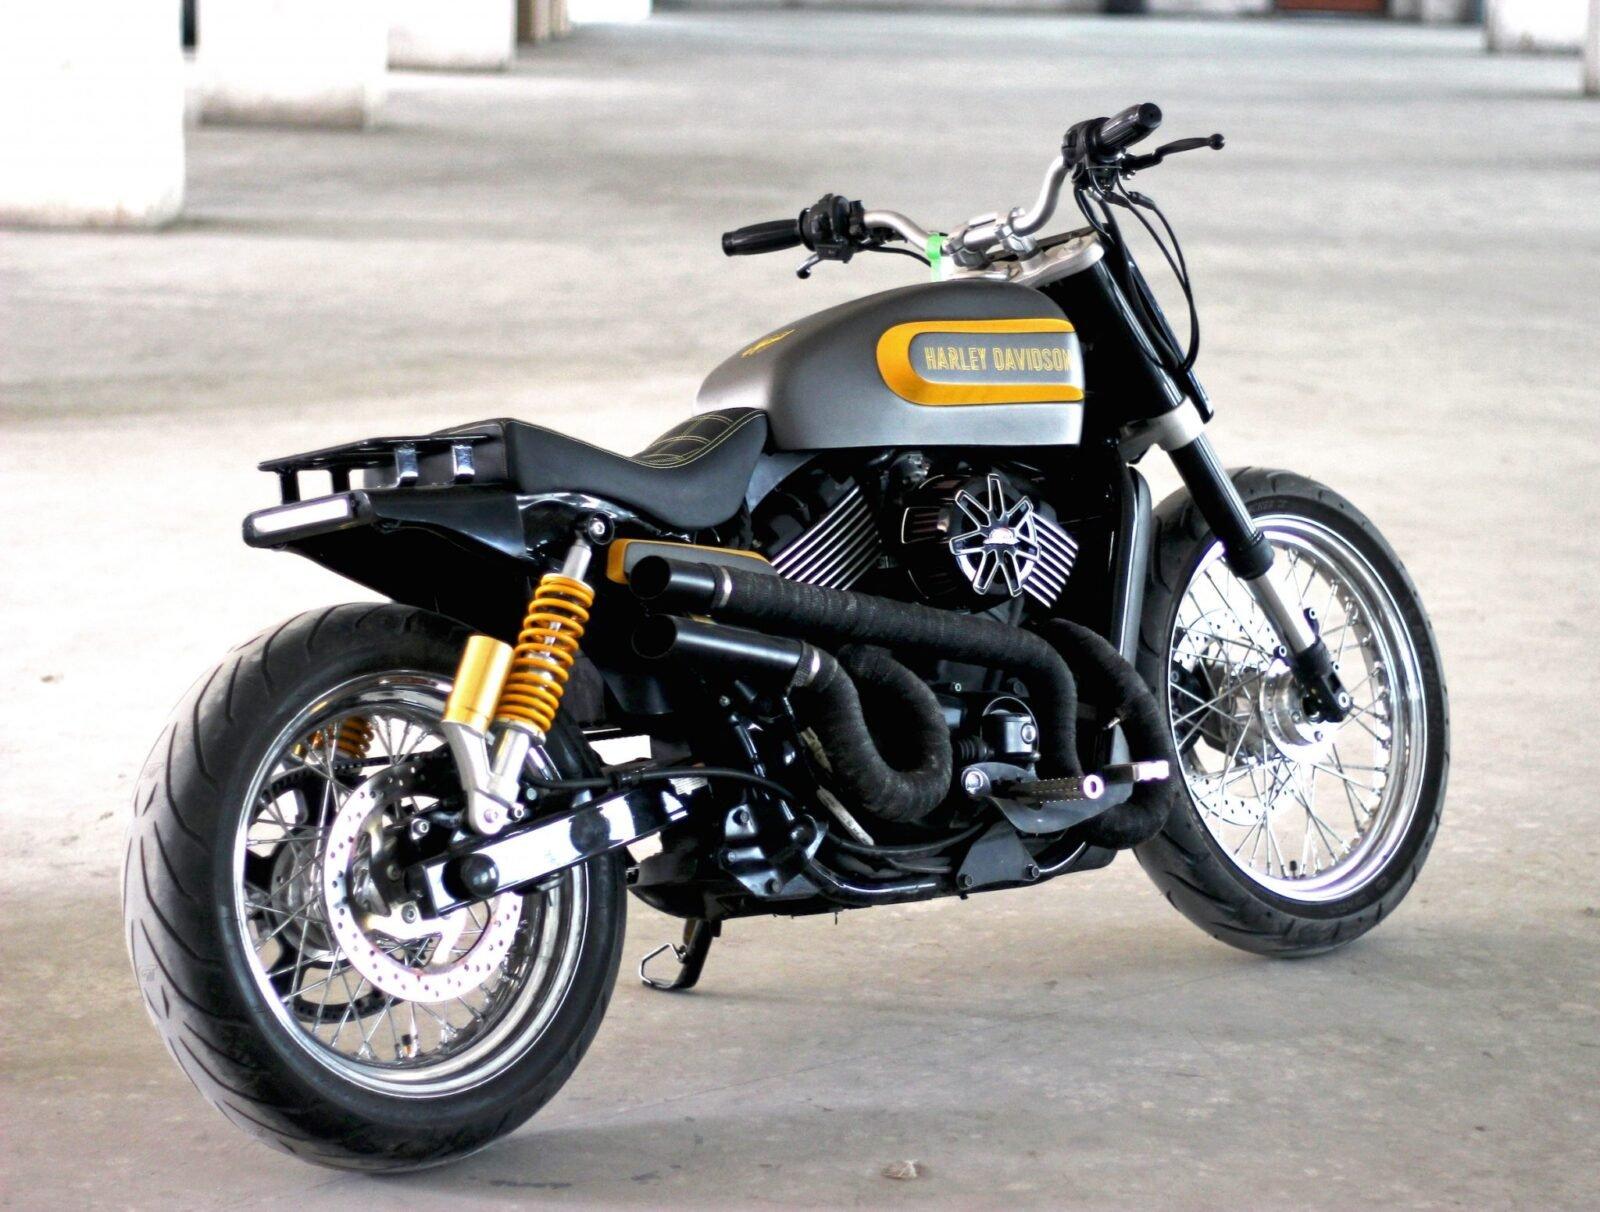 Harley Davidson Night Rod Price In Usa